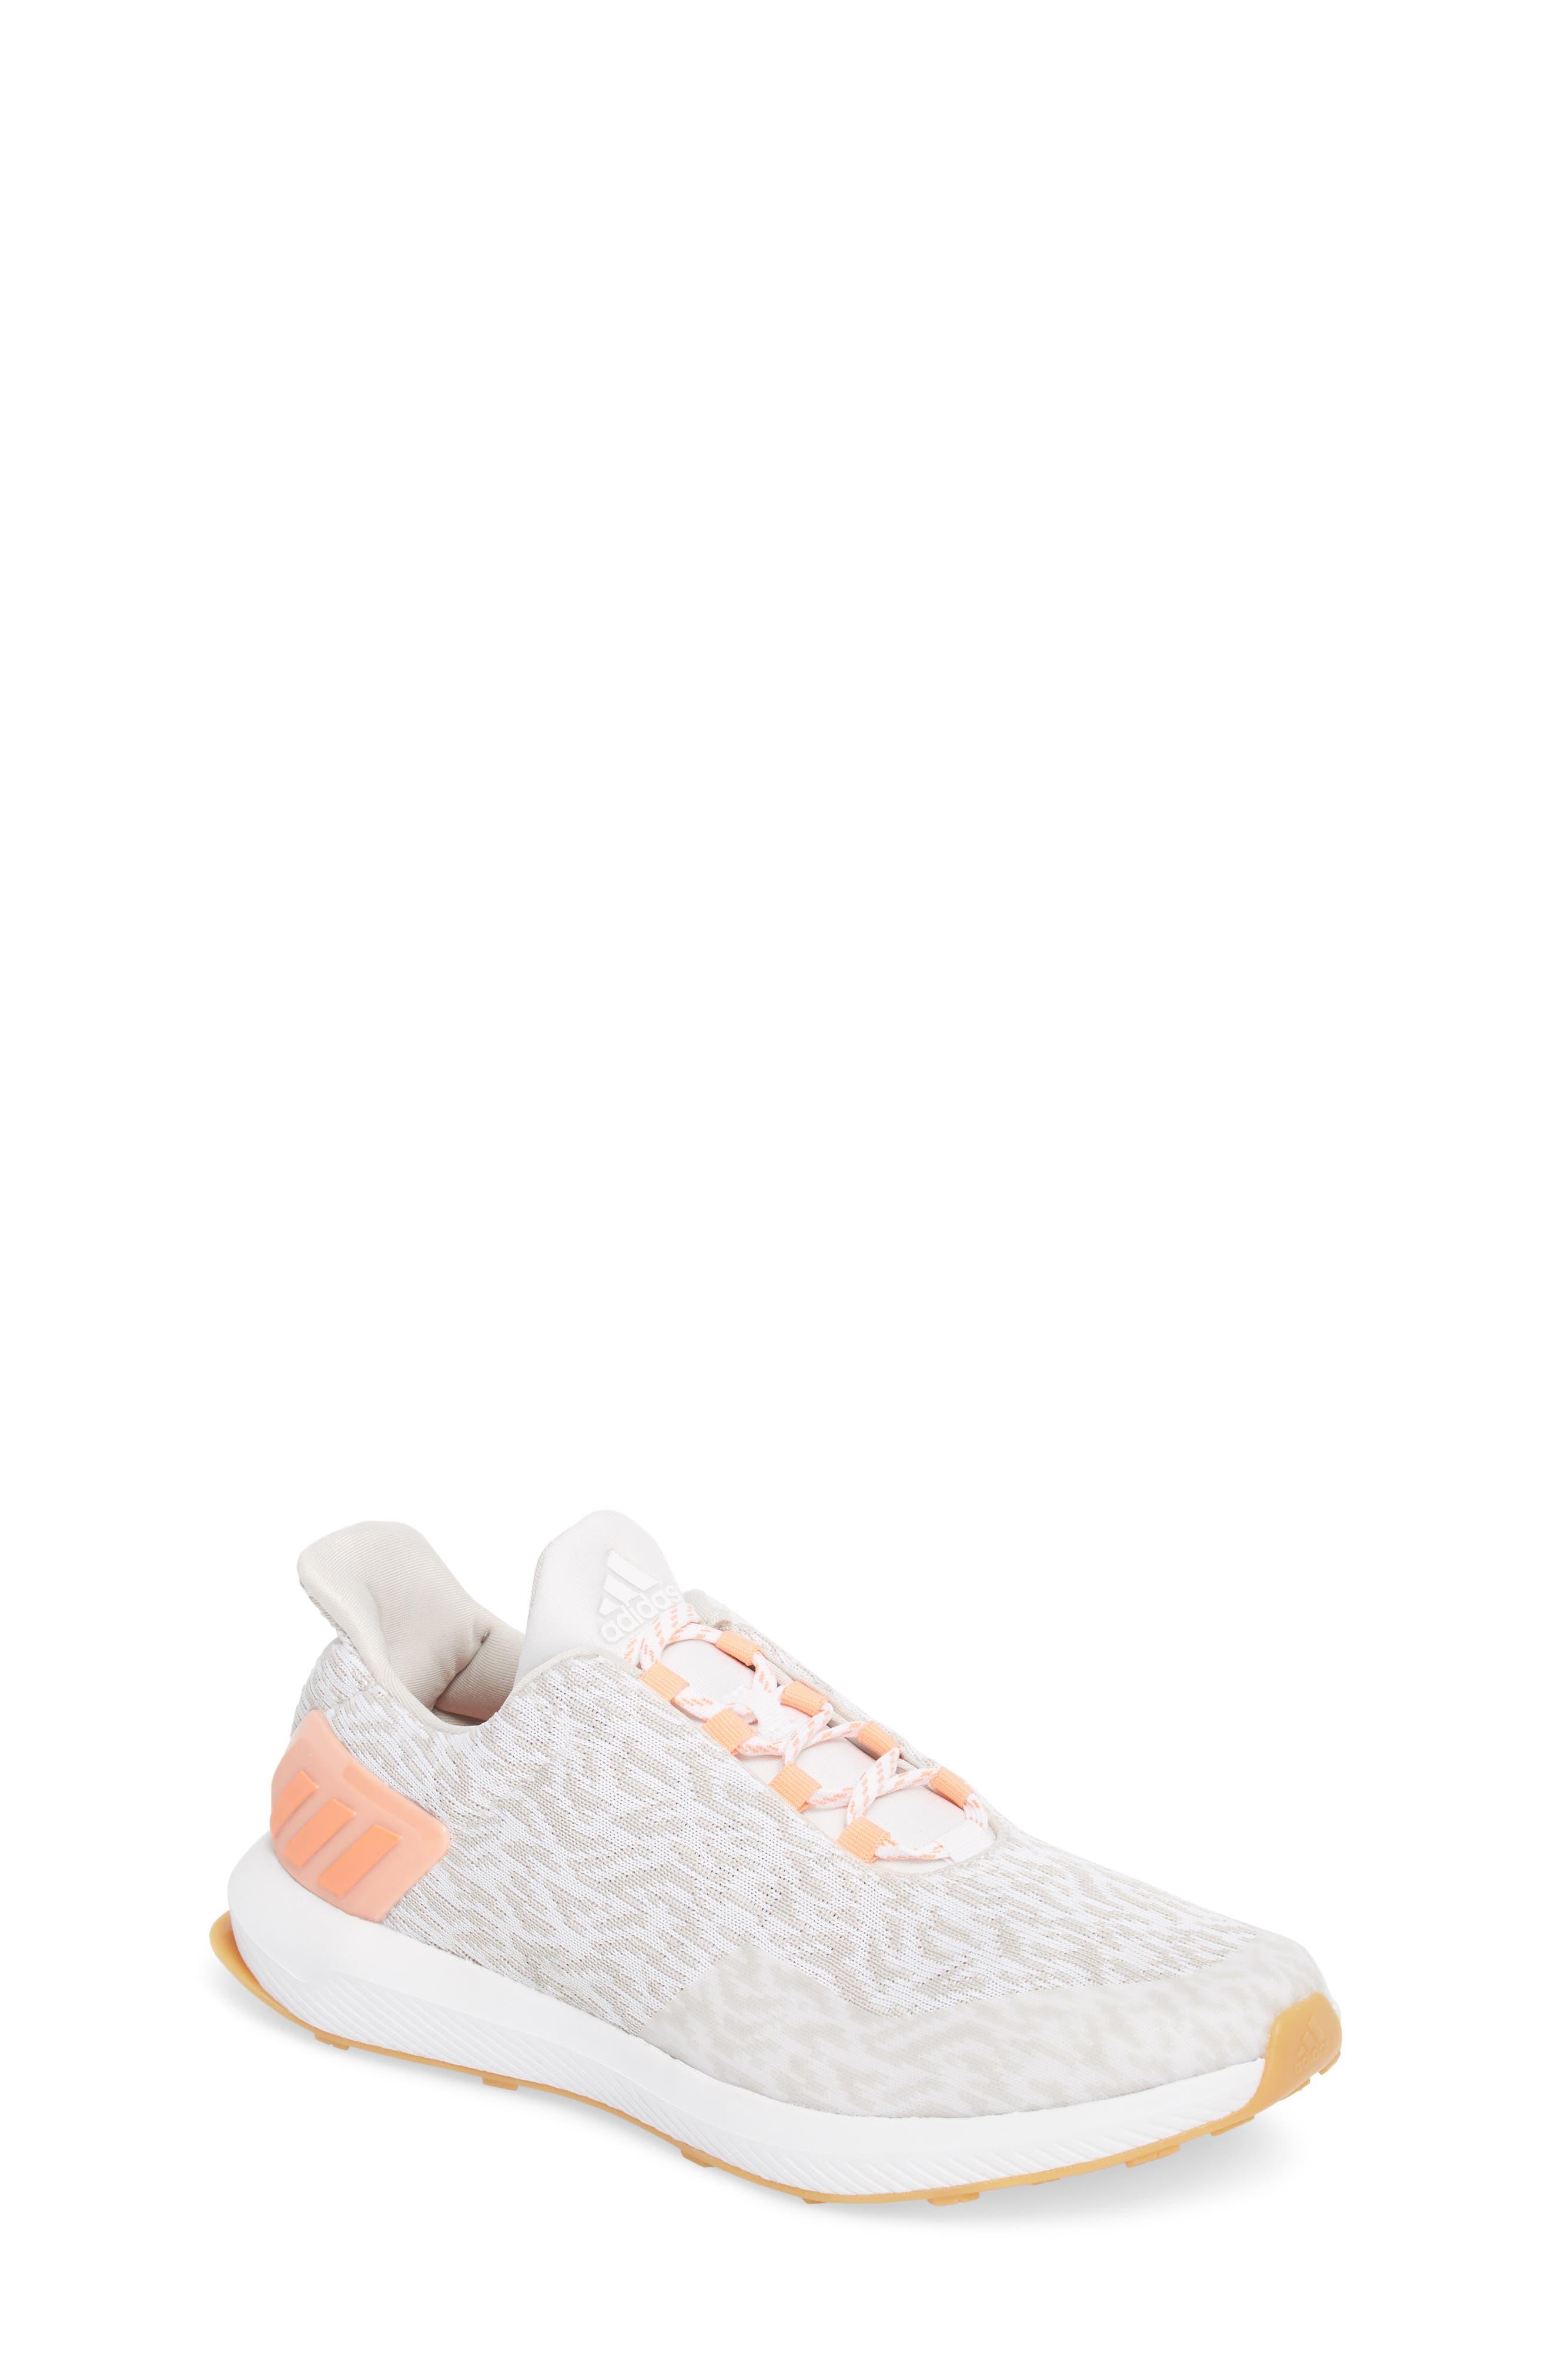 RapidaRun Uncaged Sneaker,                             Main thumbnail 1, color,                             White / Pearl/ Coral